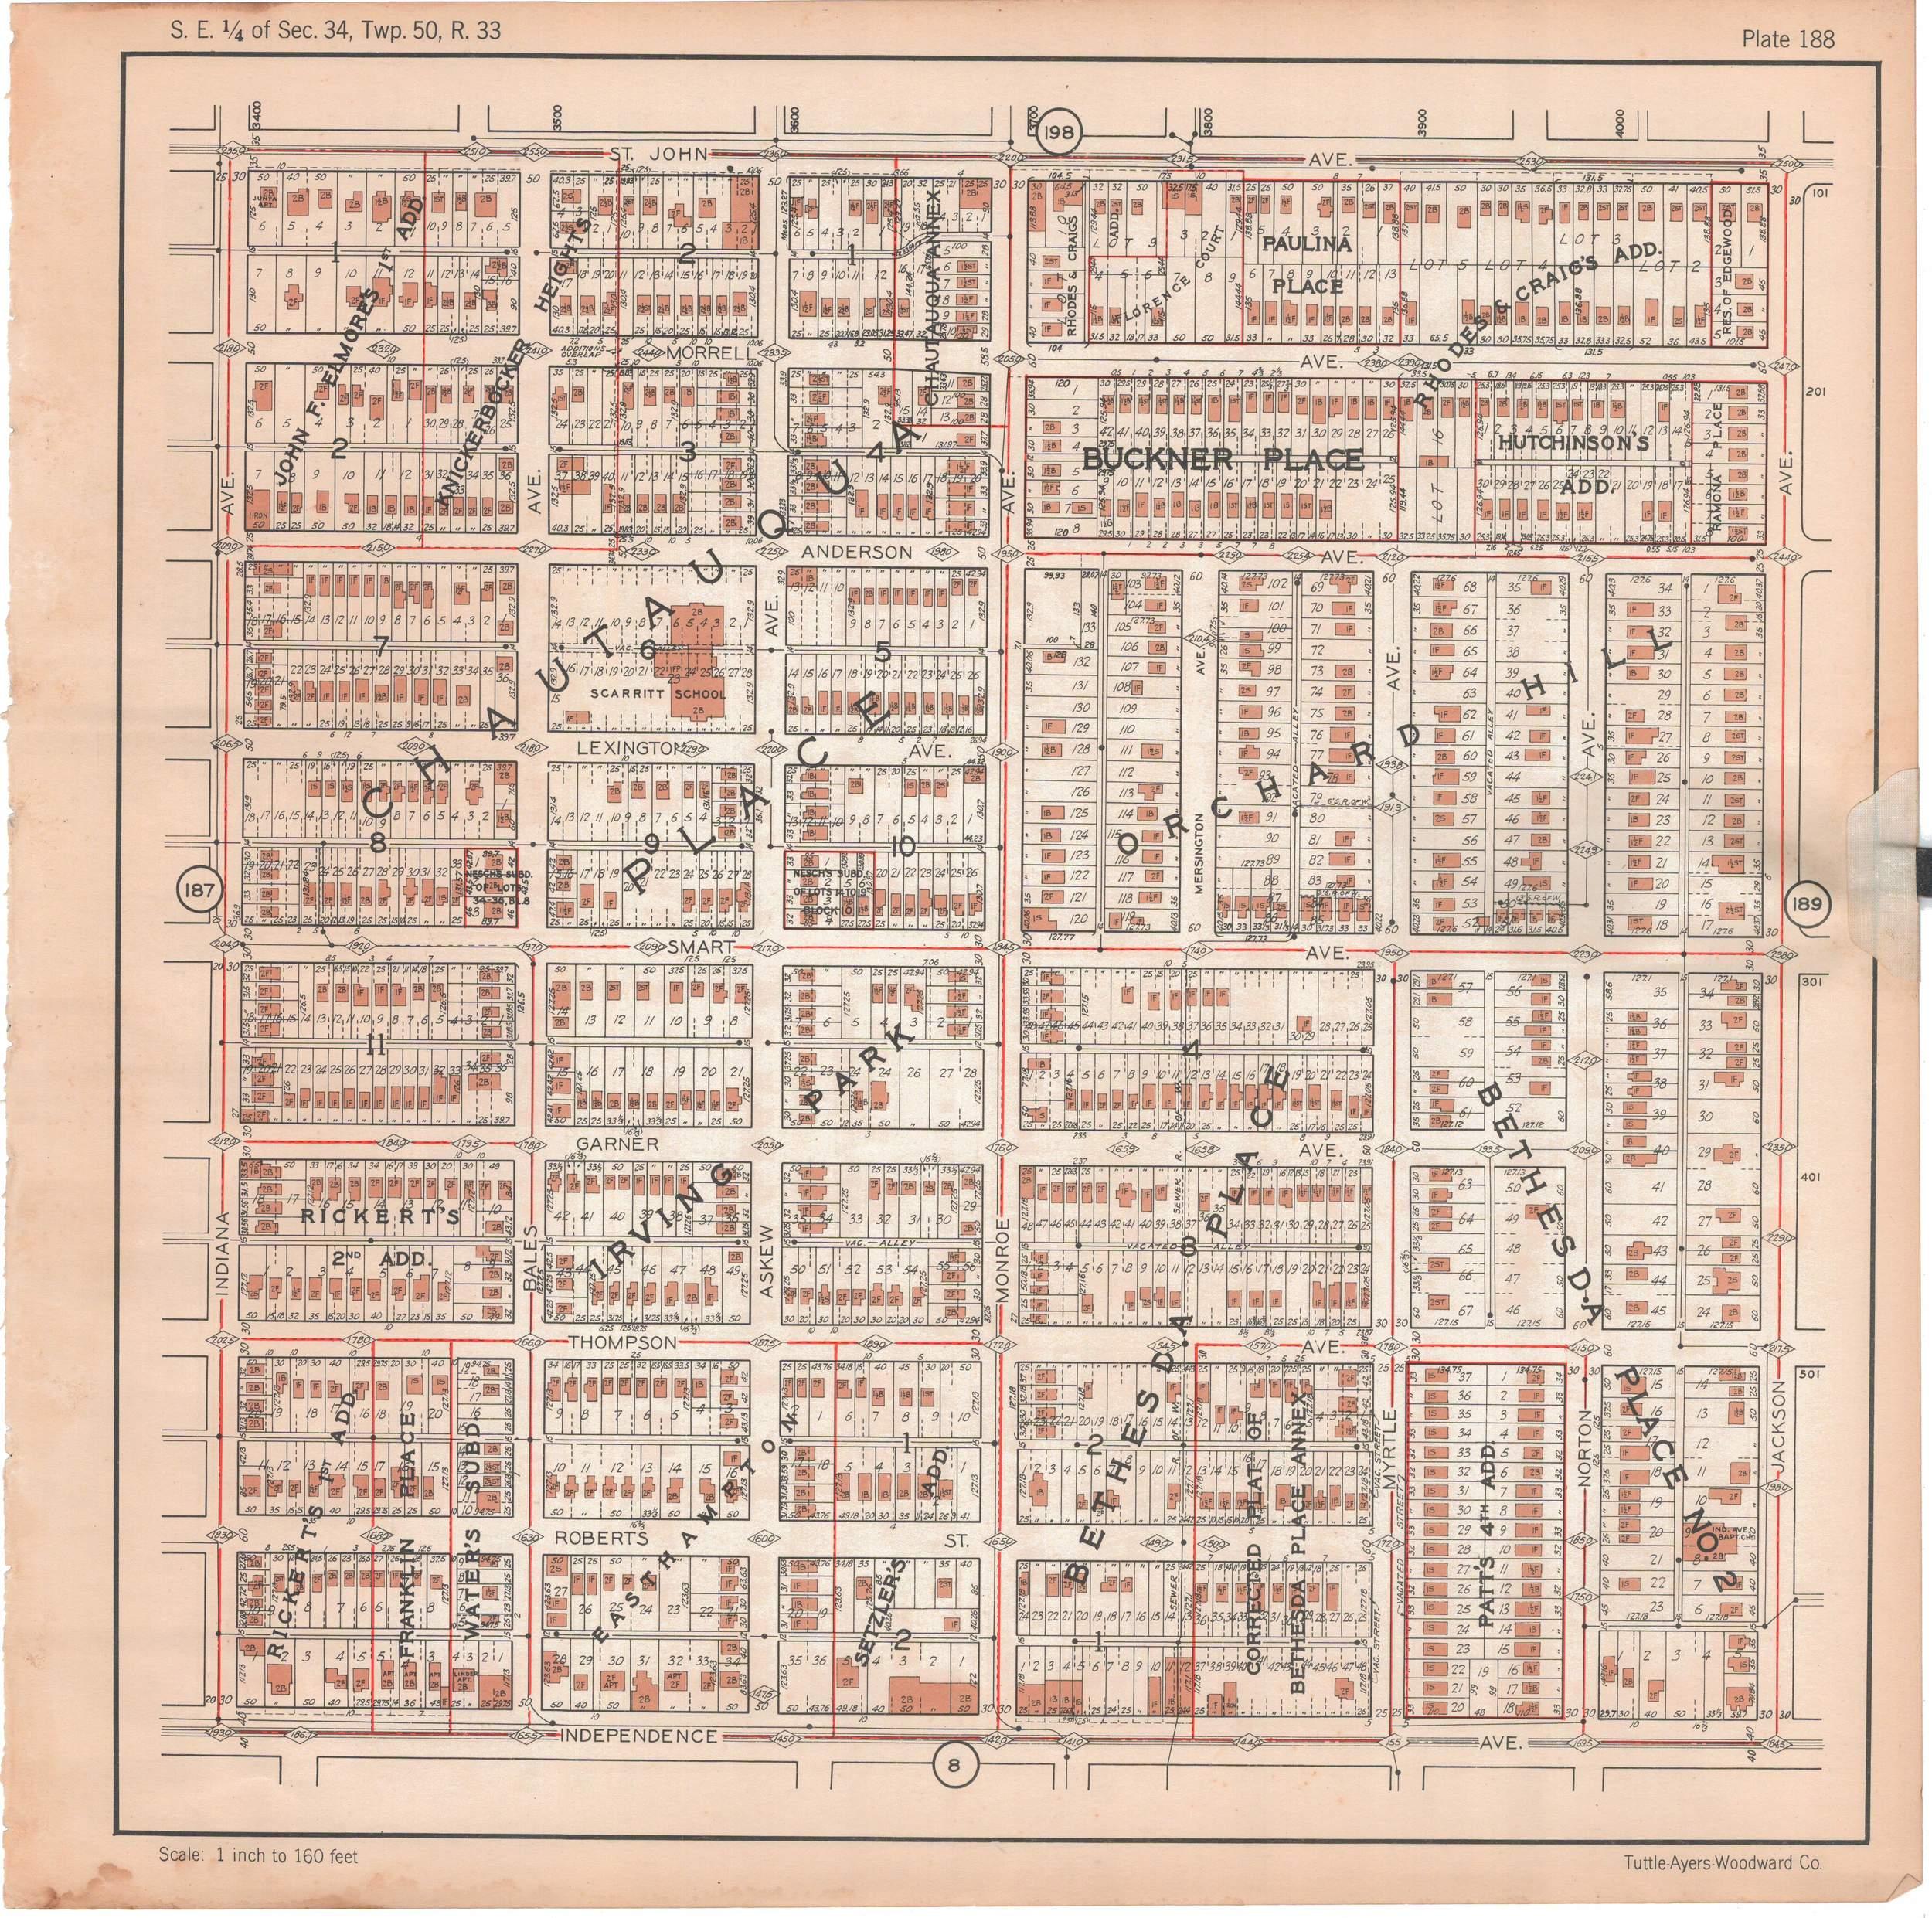 1925 TUTTLE_AYERS_Plate_188.JPG